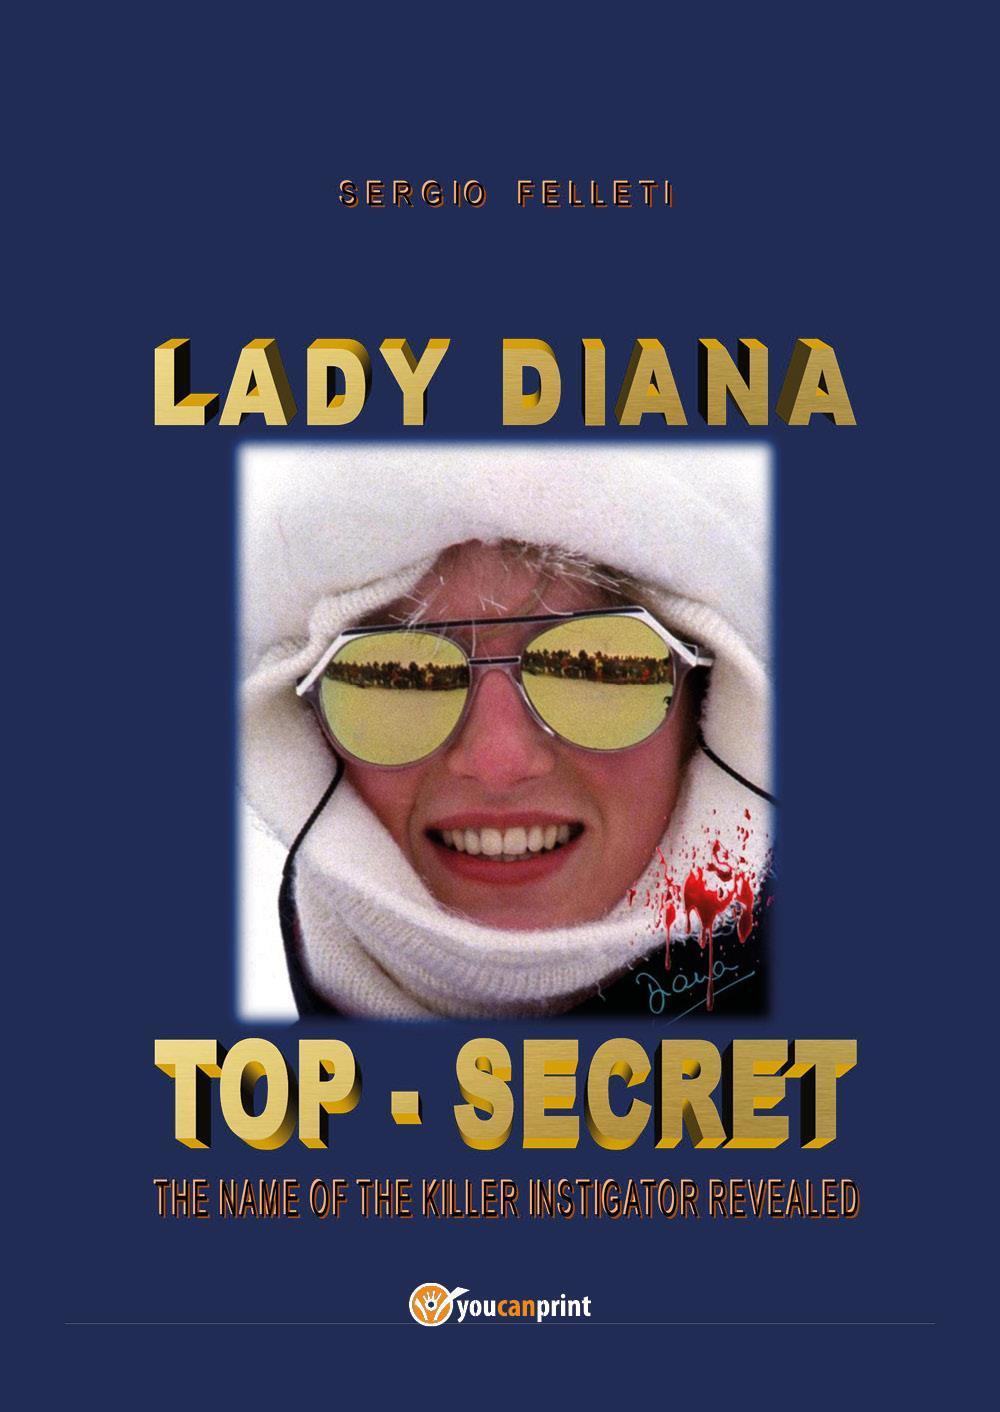 Lady Diana - top secret - the name of the killer instigator revealed